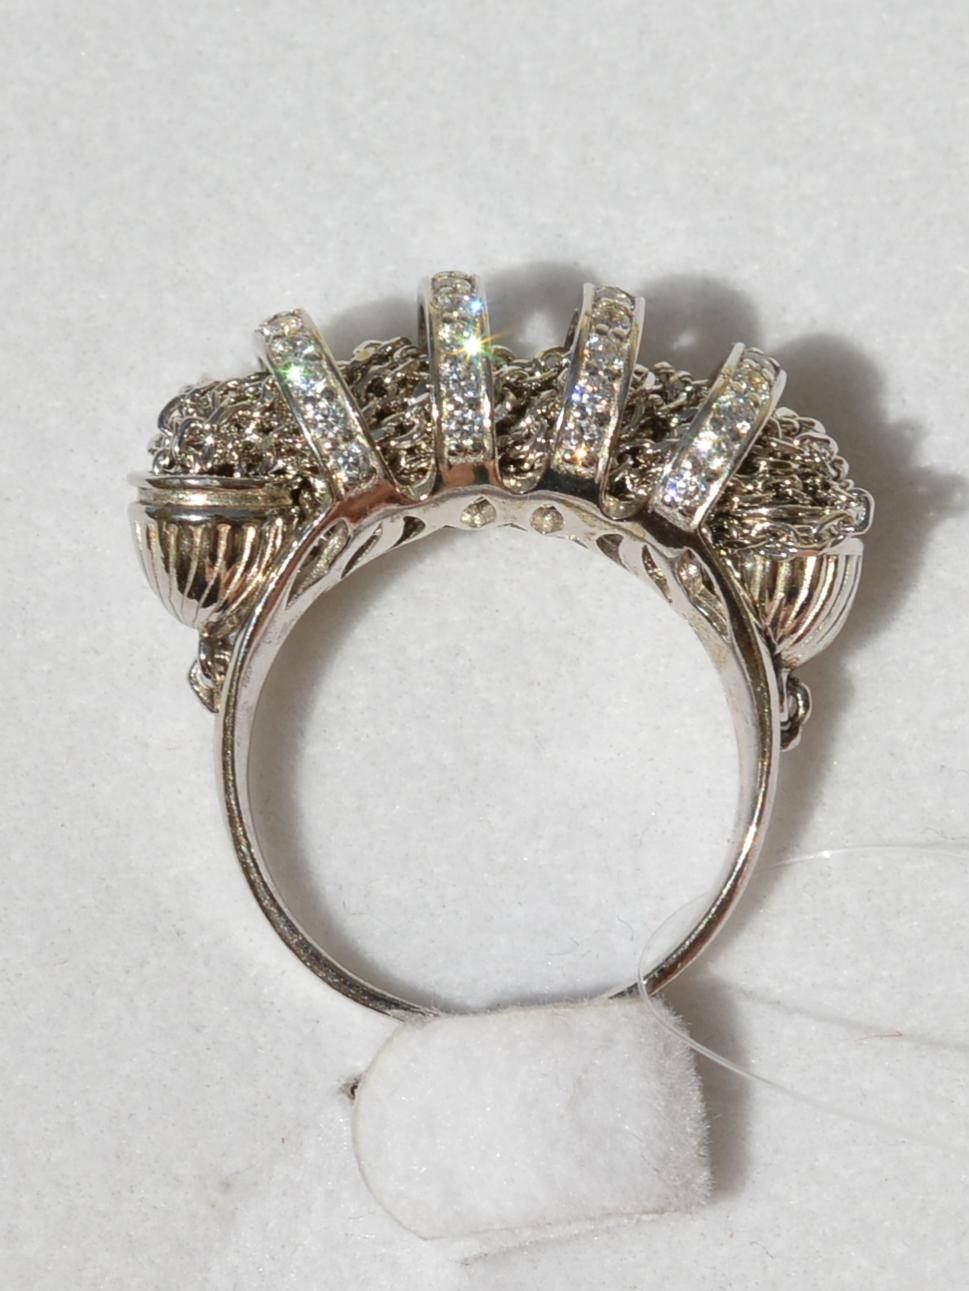 0121469 (кольцо из серебра)